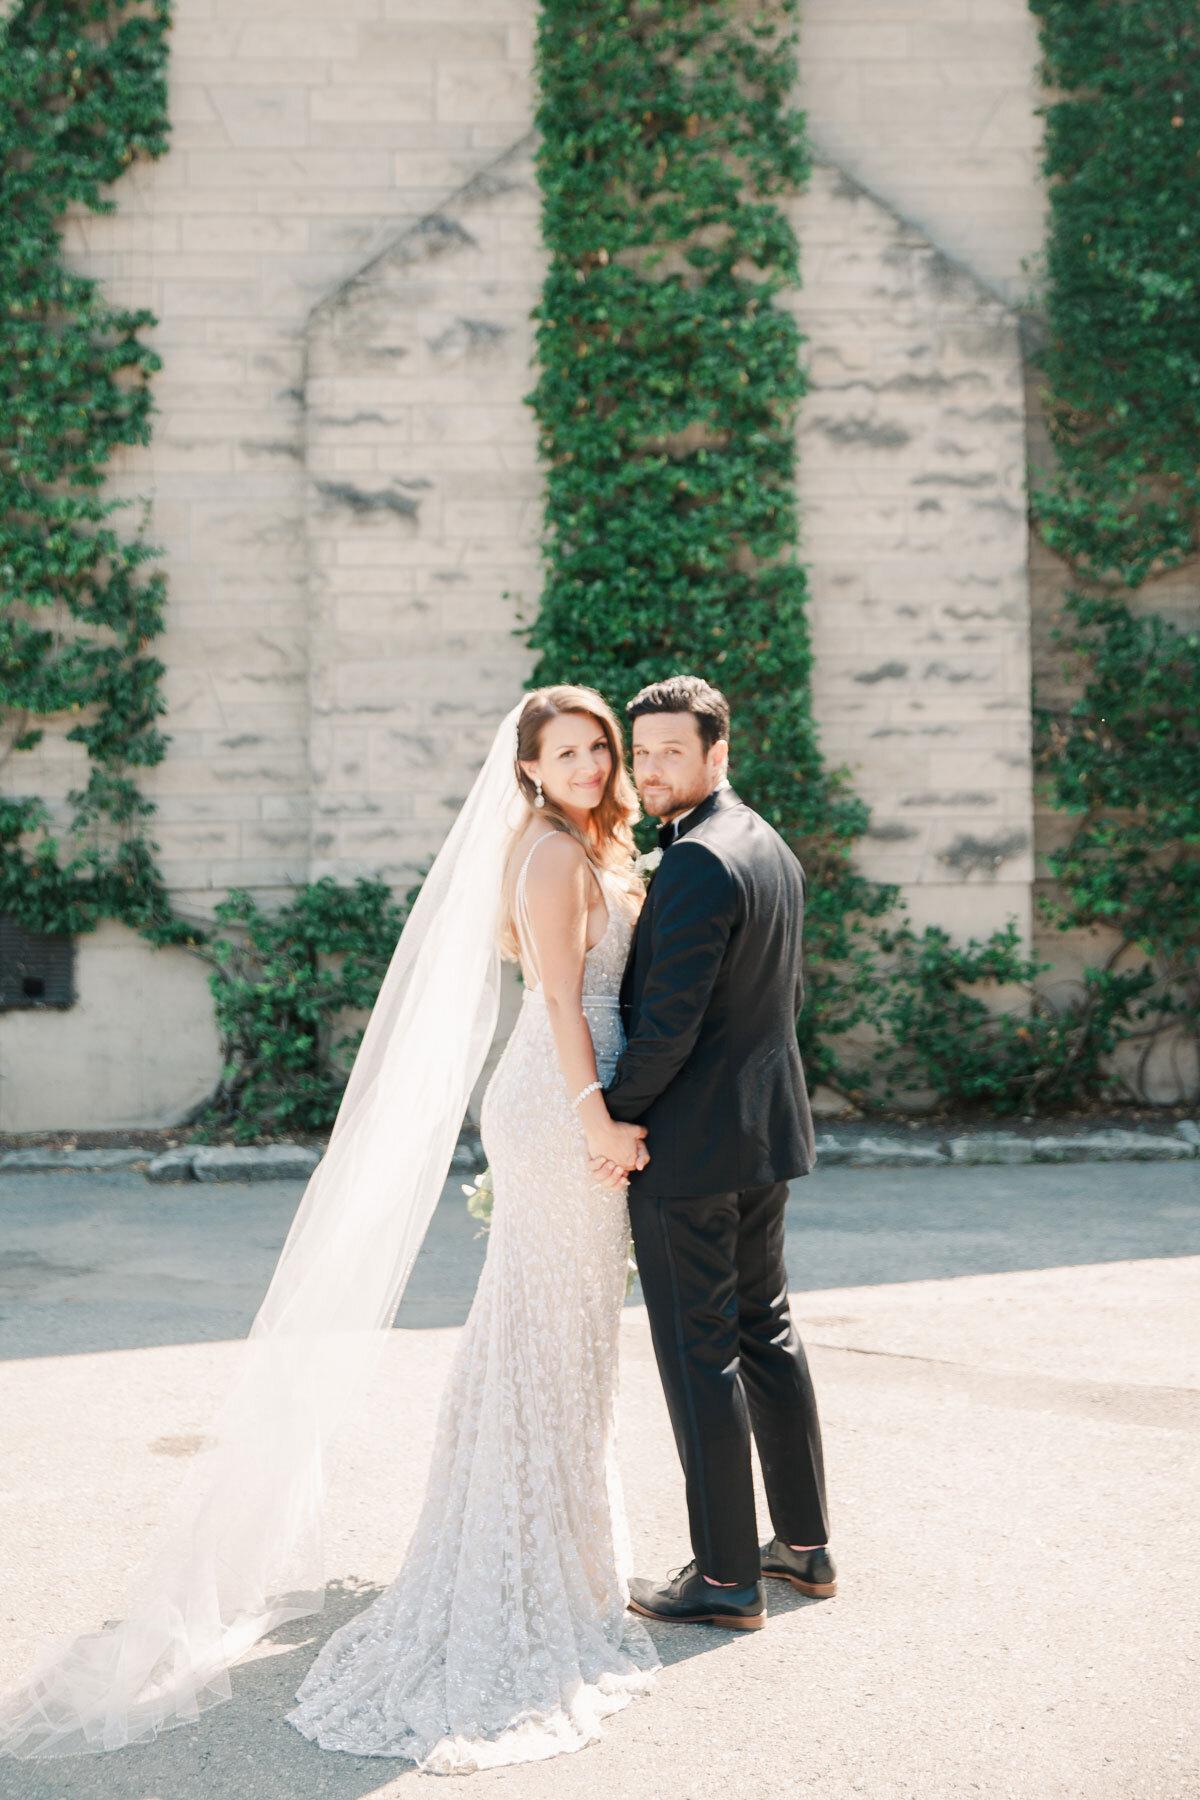 Chateau-des-Charmes-Wedding-Summer-Vineyard-Bride-Niagara-on-the-Lake-photos-by-Gemini-Photography-Ontario-0035.jpg